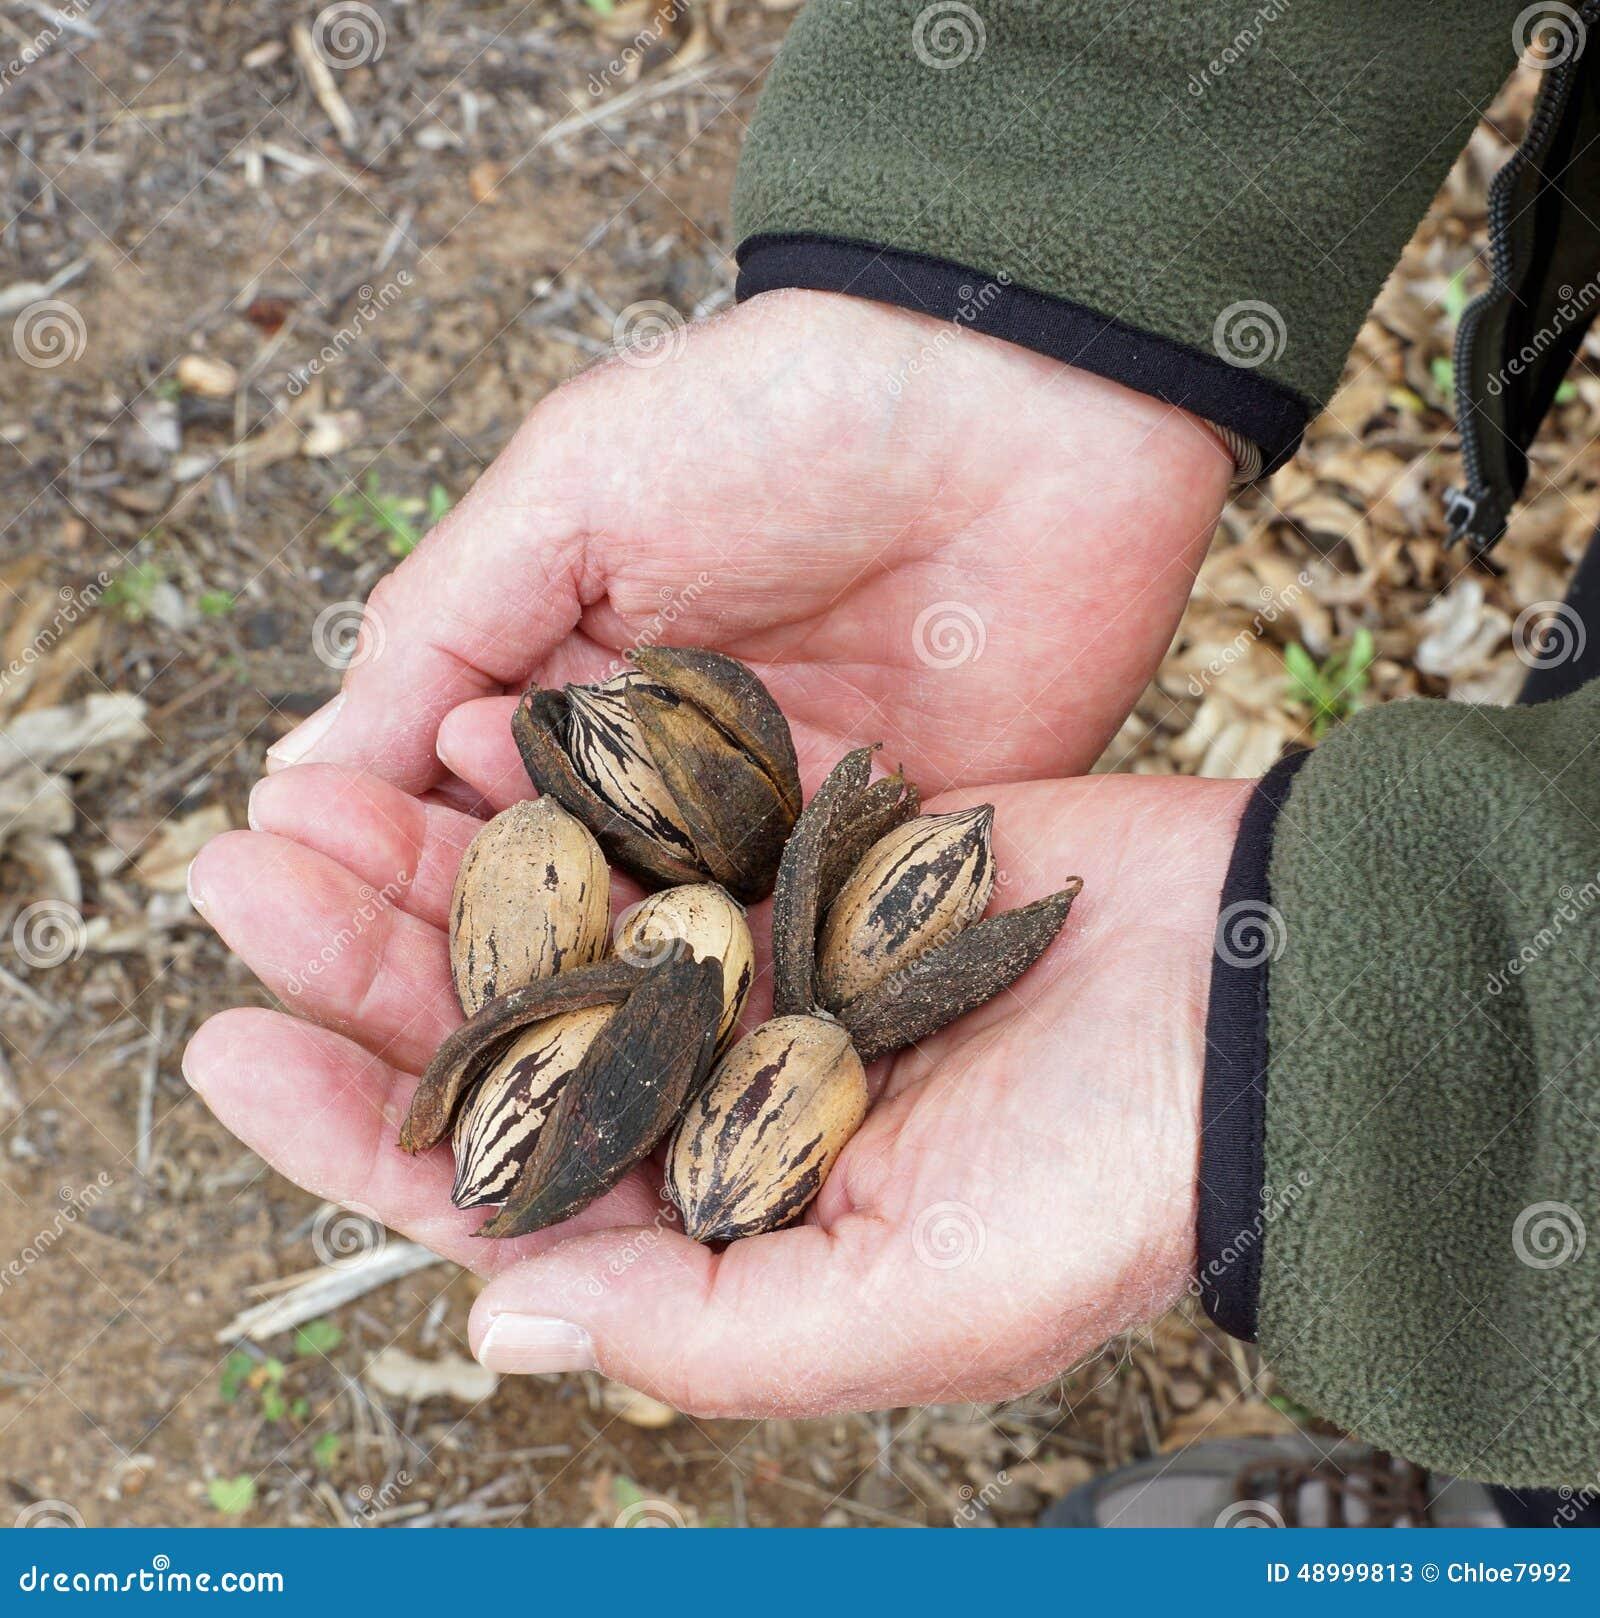 Farmer checks his crop of pecans